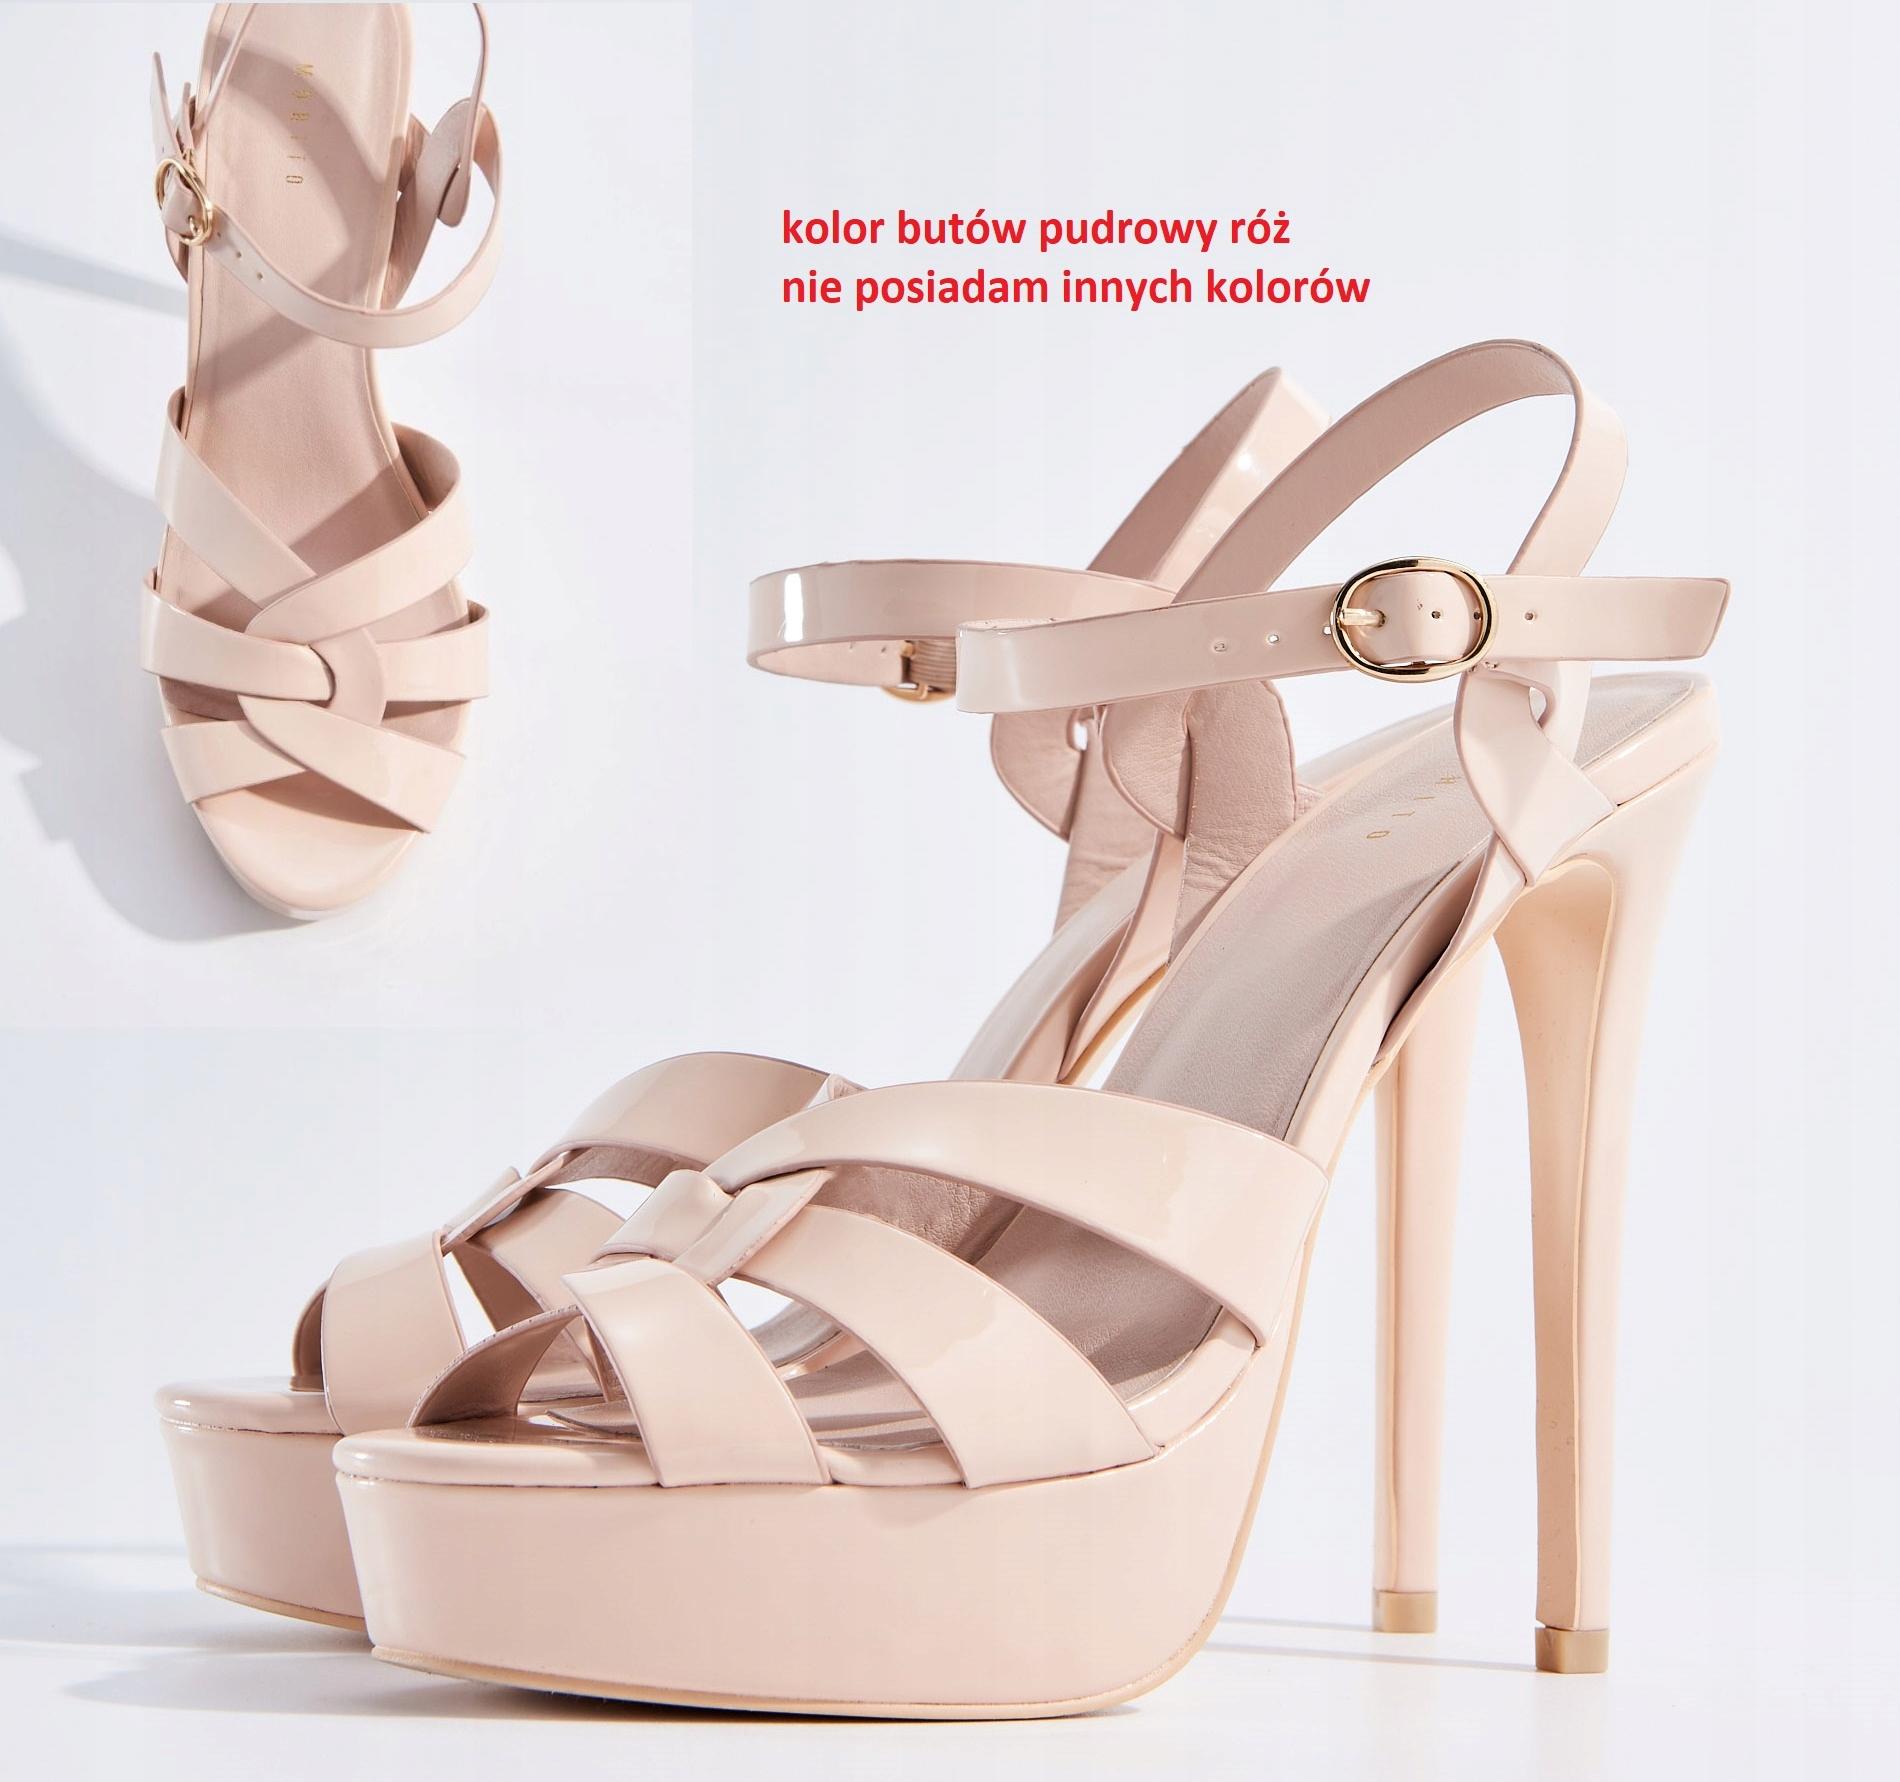 639555e2 MOHITO 37 kolor butów pudrowy różowy high heels